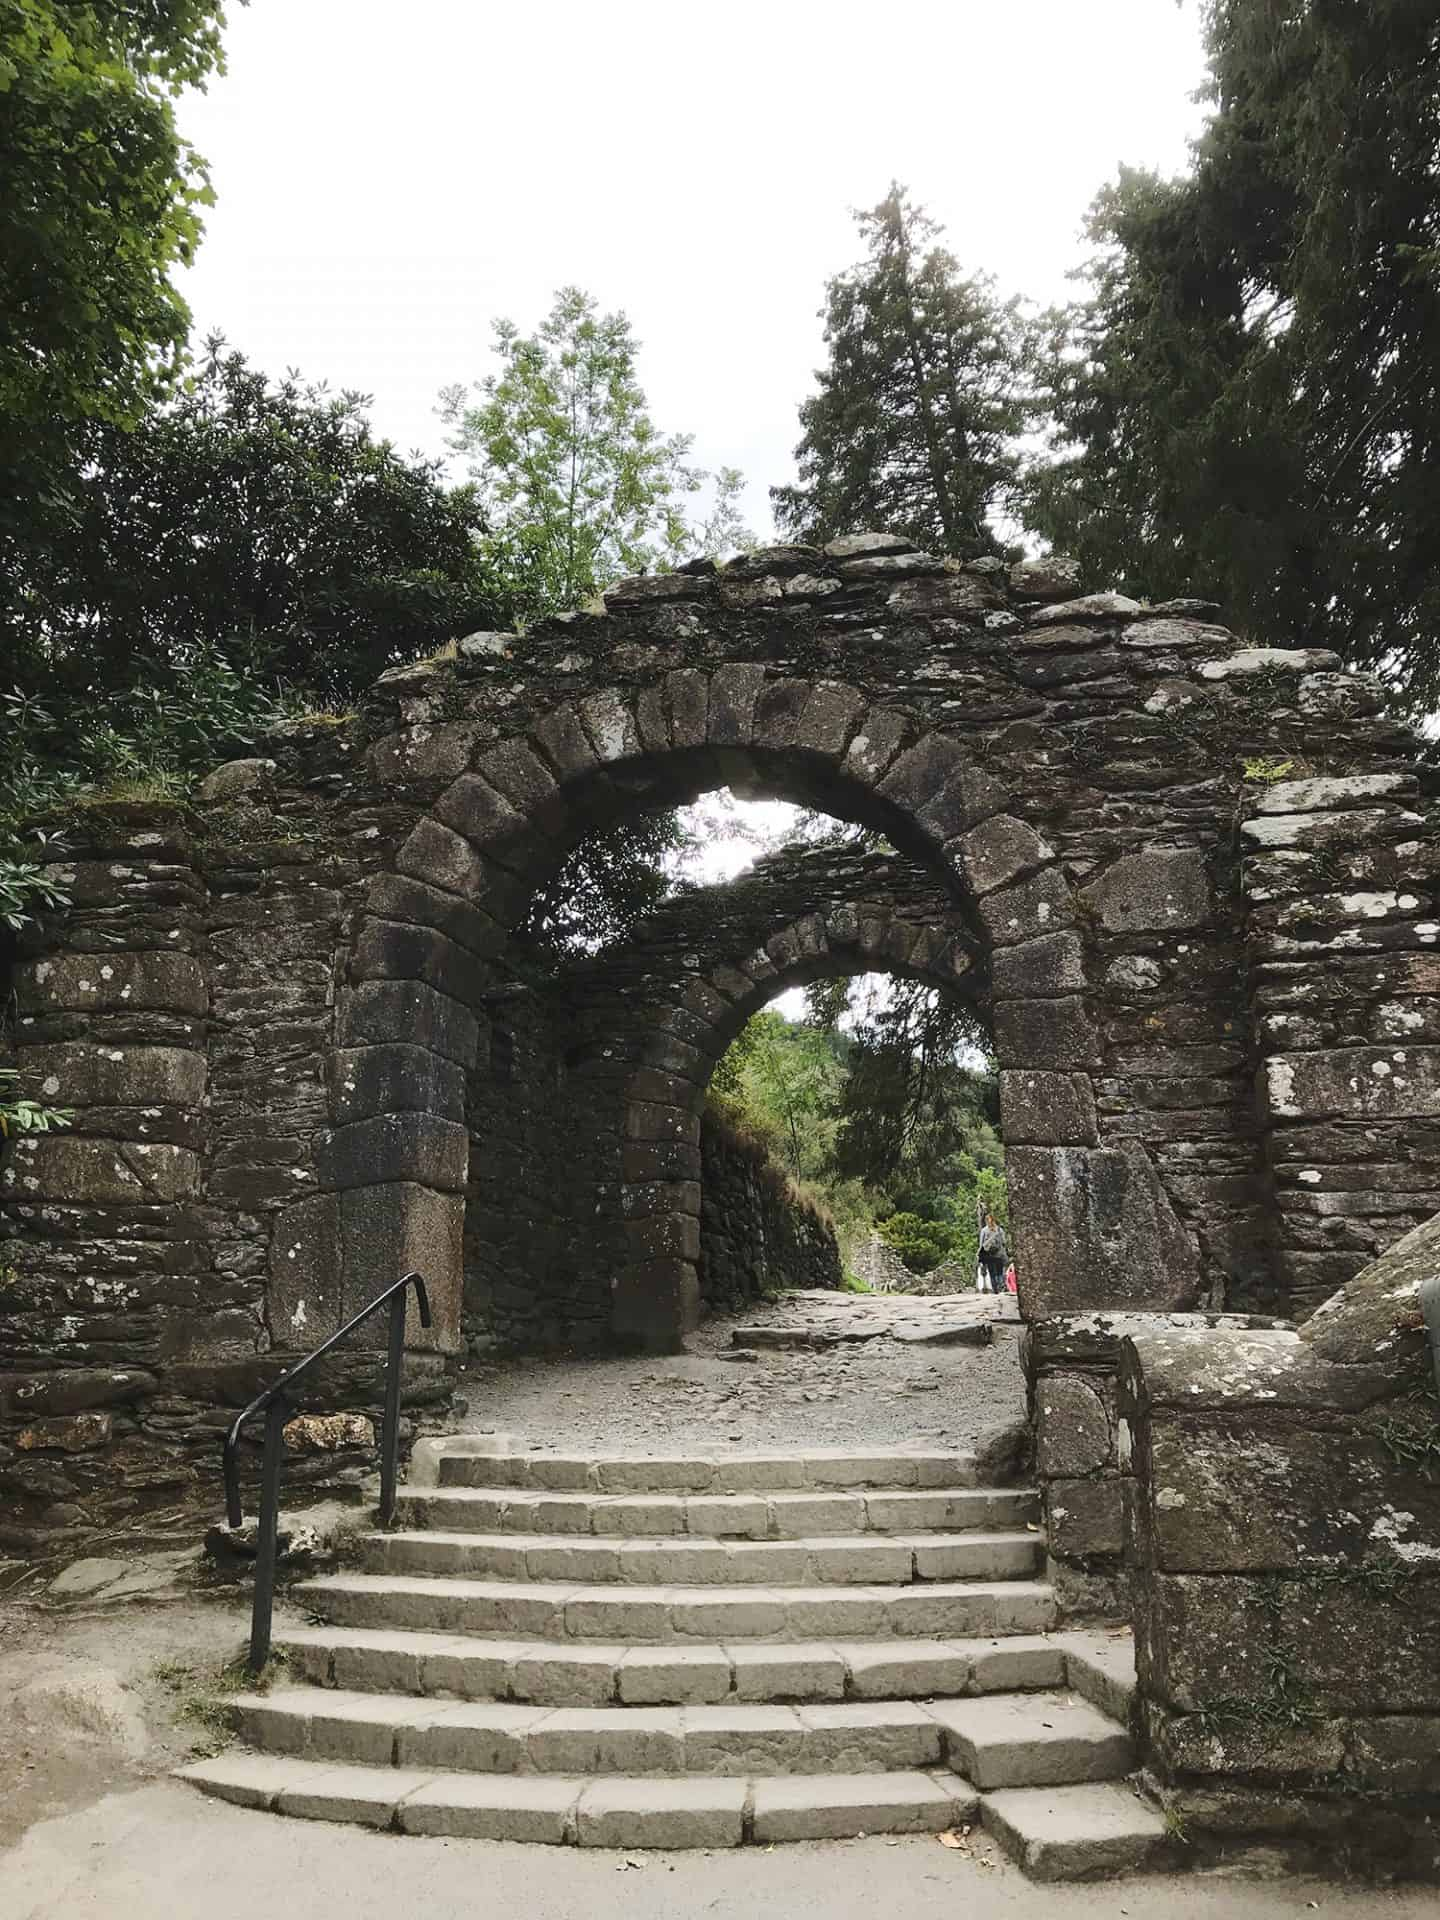 Glendalough Monastic Site in Wicklow, Ireland